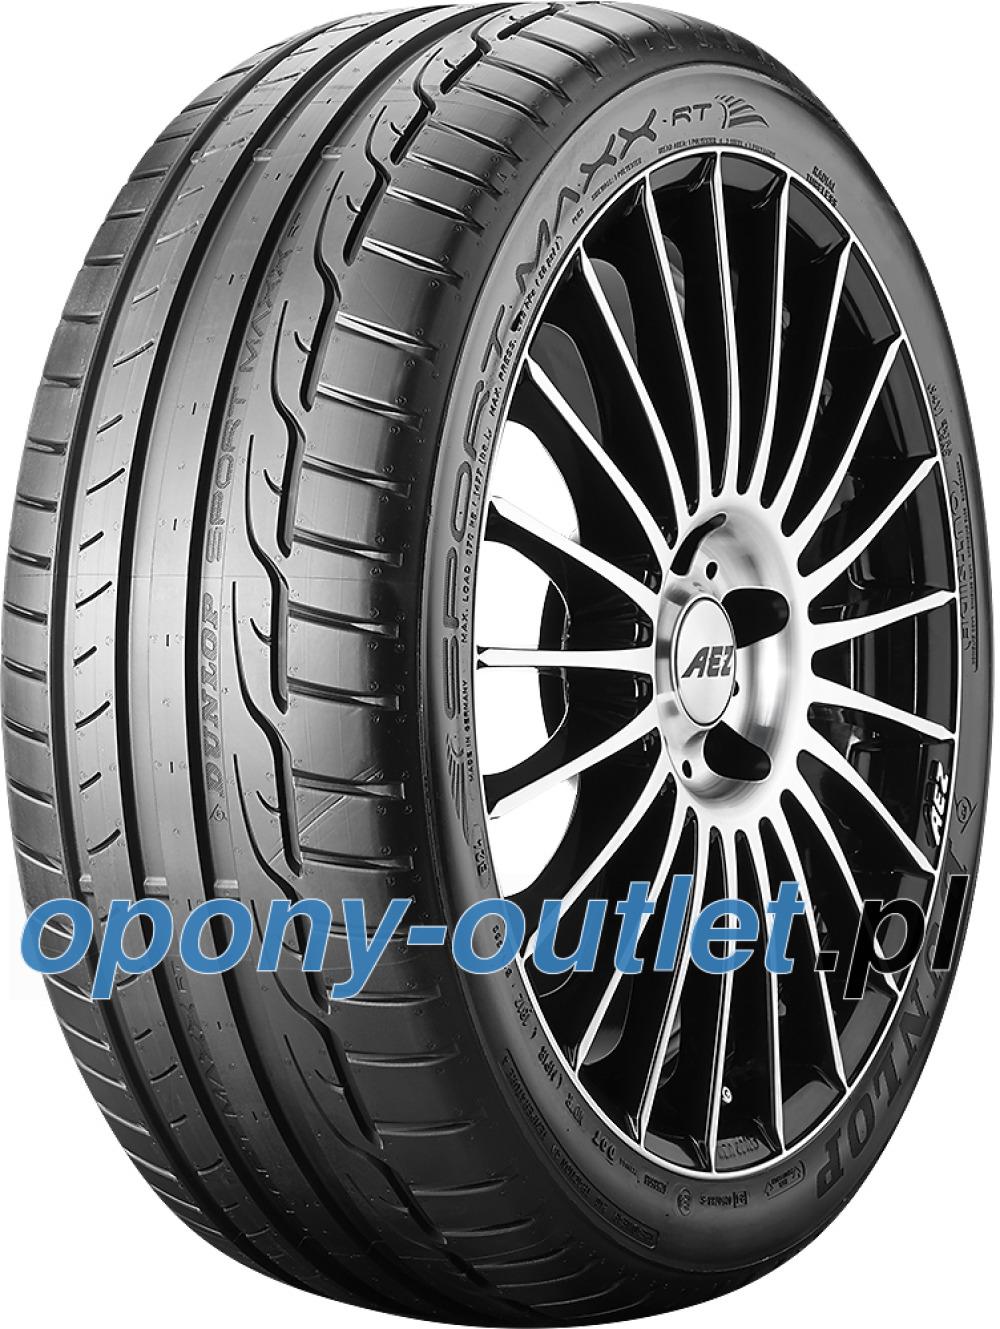 Dunlop Sport Maxx RT ( 225/45 R19 92W osłona felgi (MFS) )